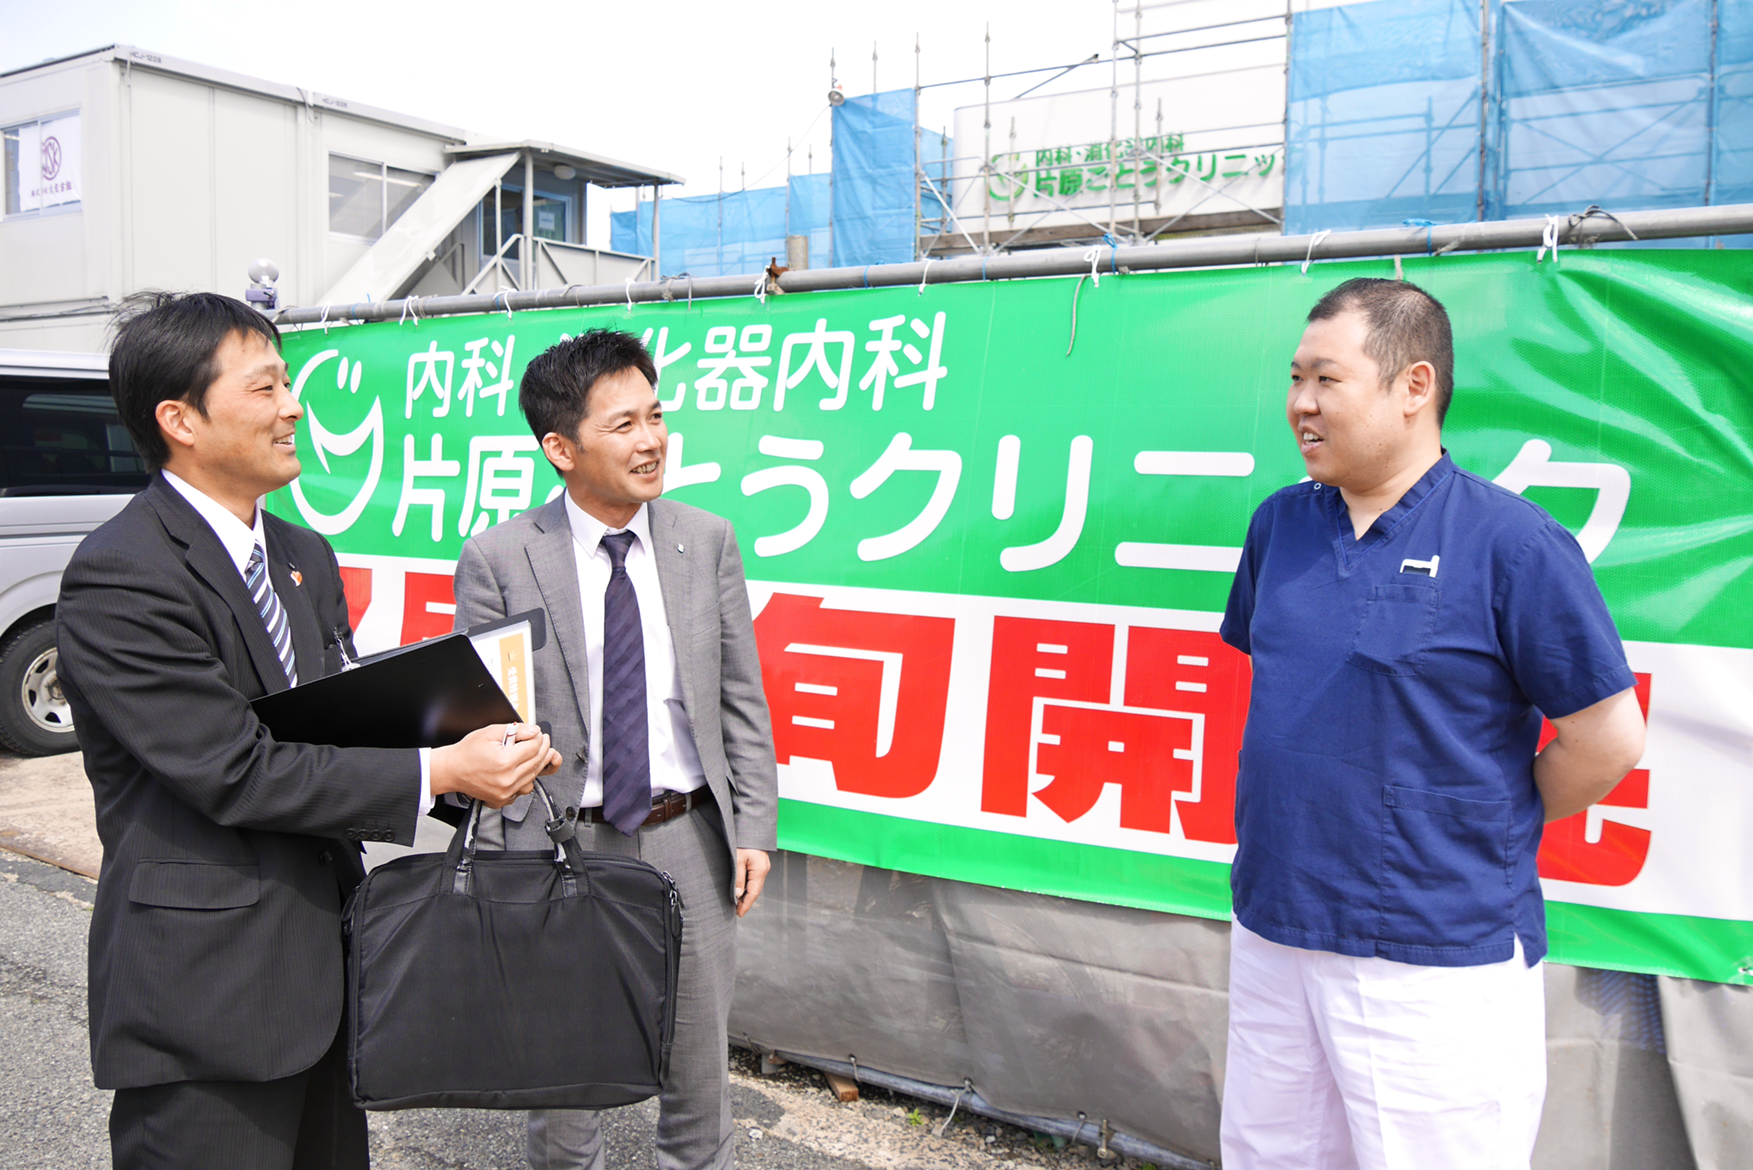 2018年4月6日号20面 鳥取銀行鳥取支店、顧客の課題解決に注力、信頼得て貸出金12億円純増